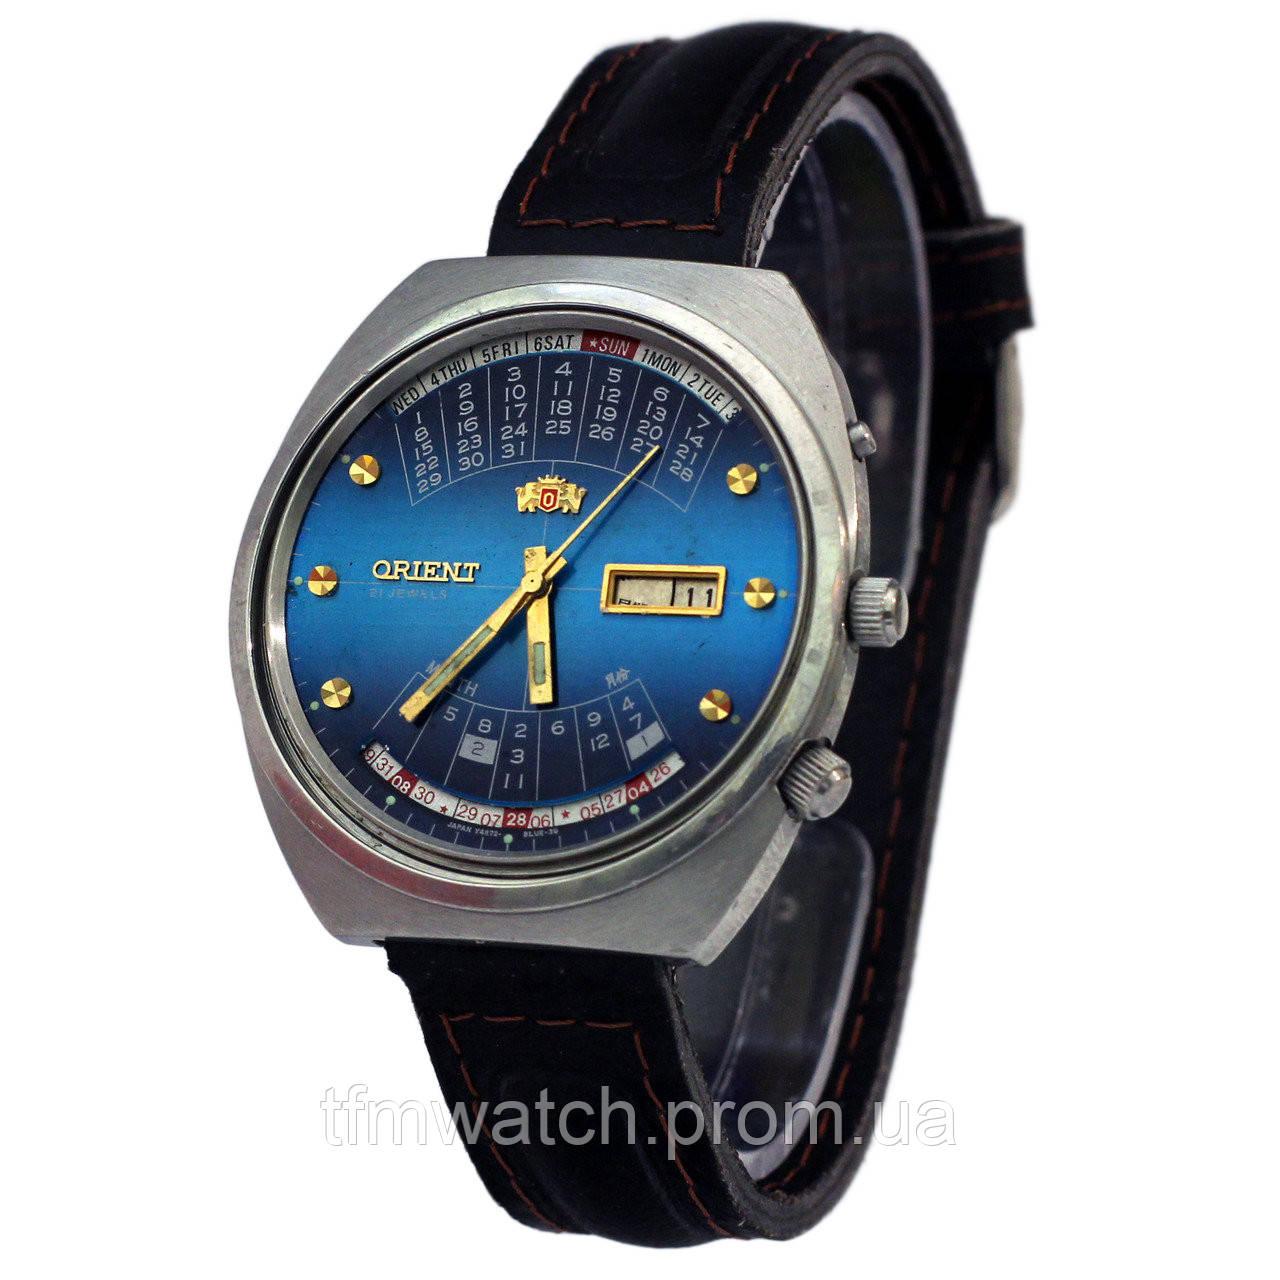 Мужские часы Ориент Колледж  продажа 253817e7c904a